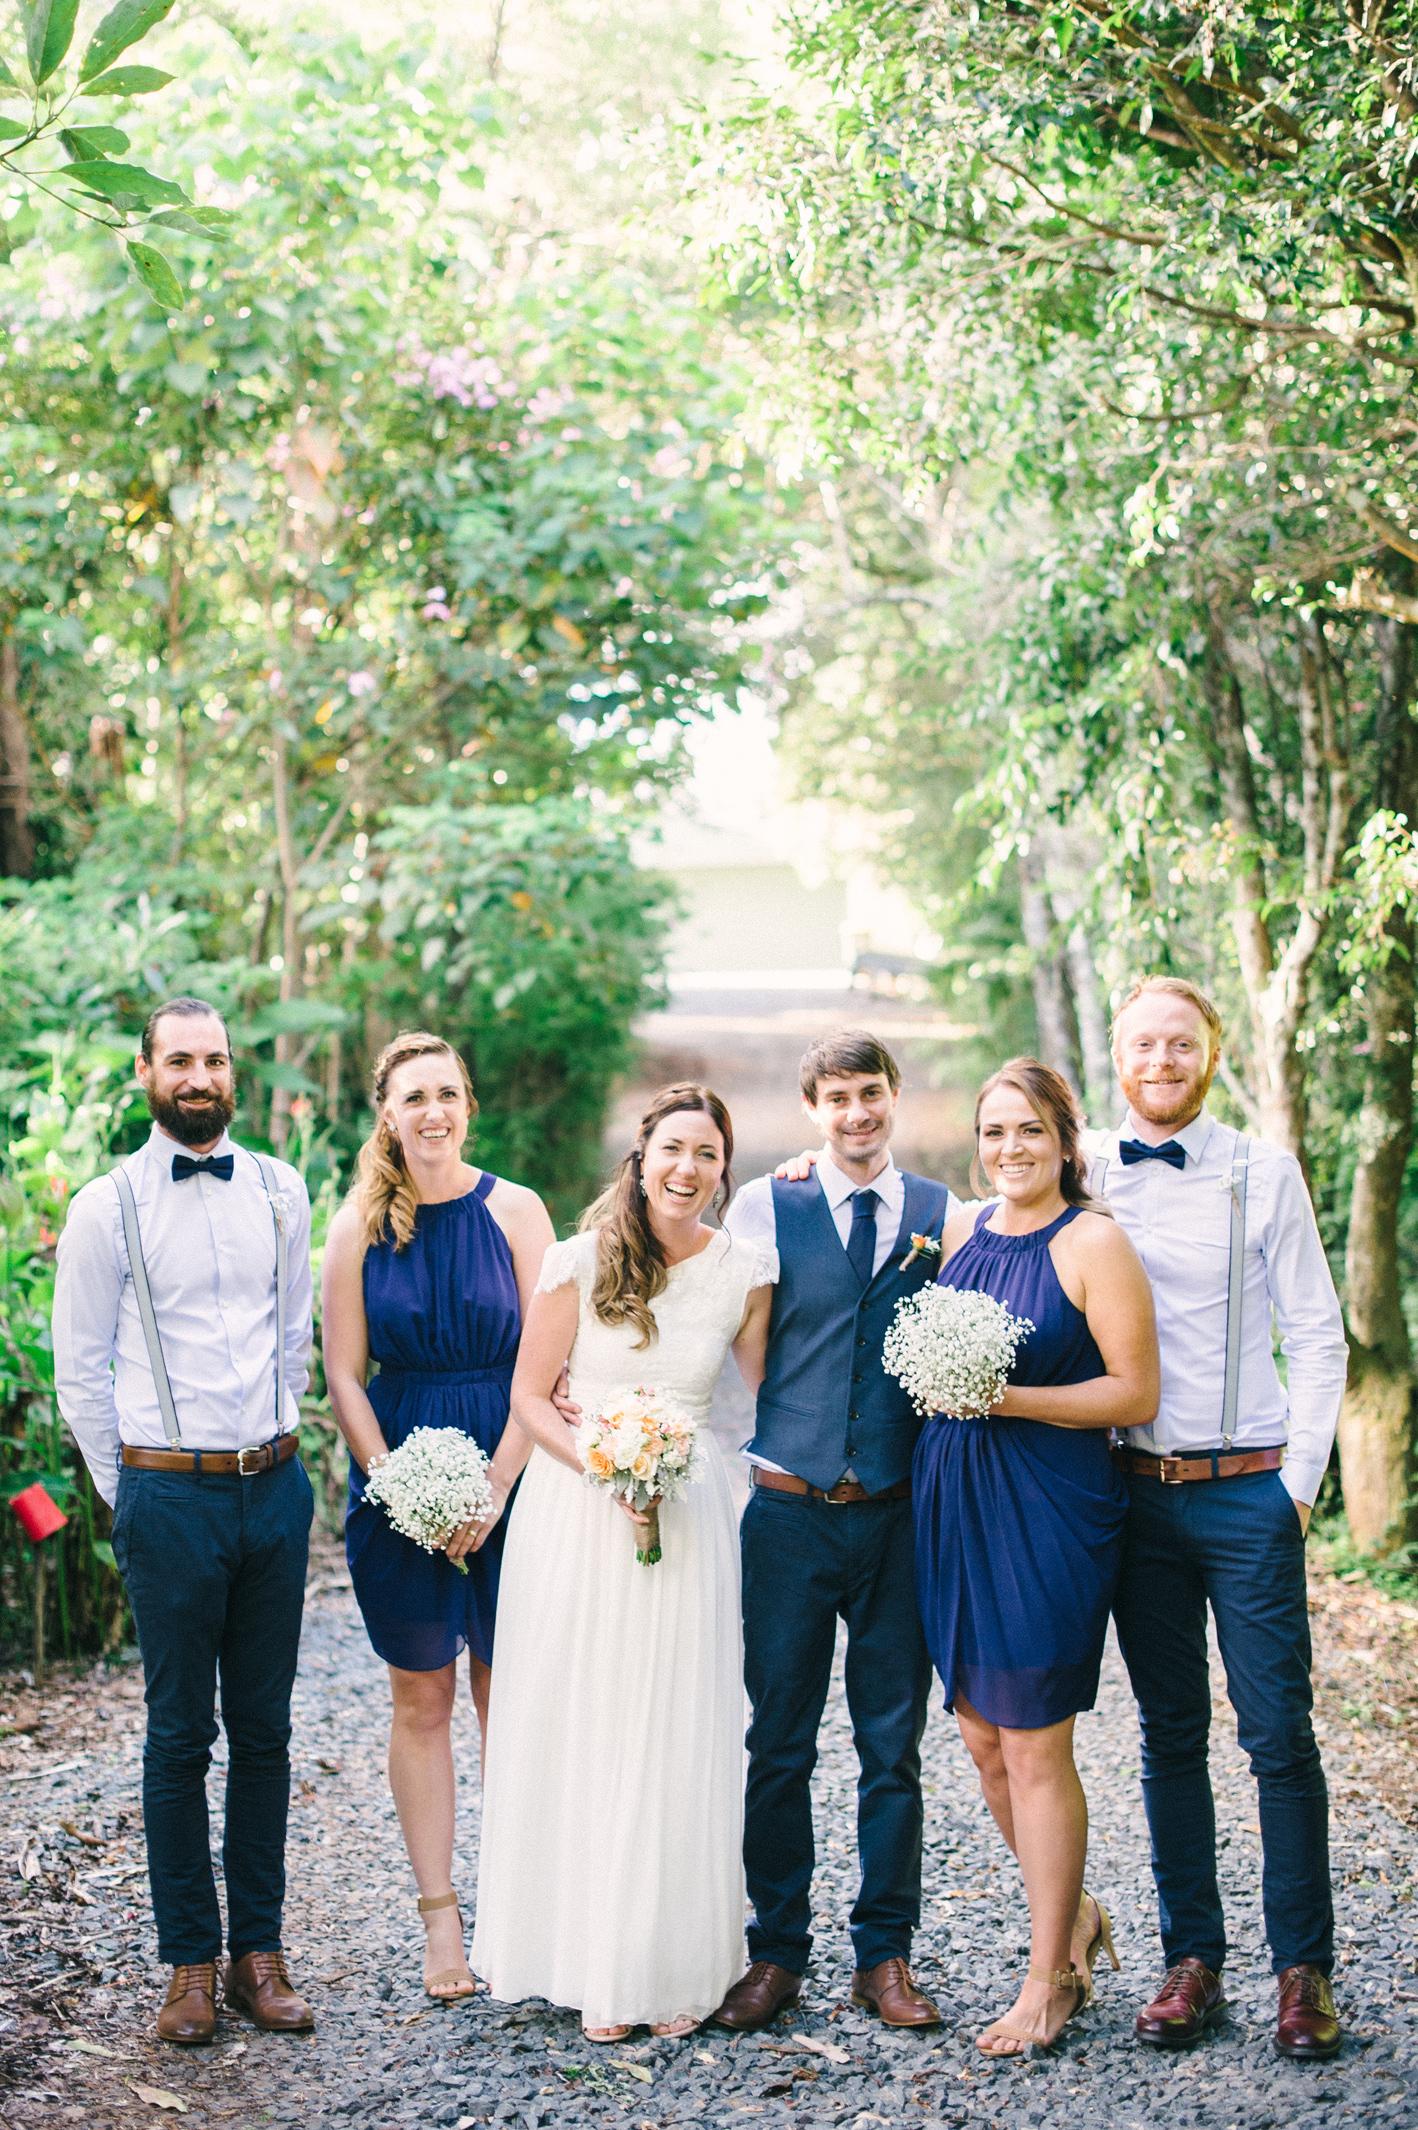 039-michelle-reagan-mount-tamborine-wedding-sophie-baker-photography